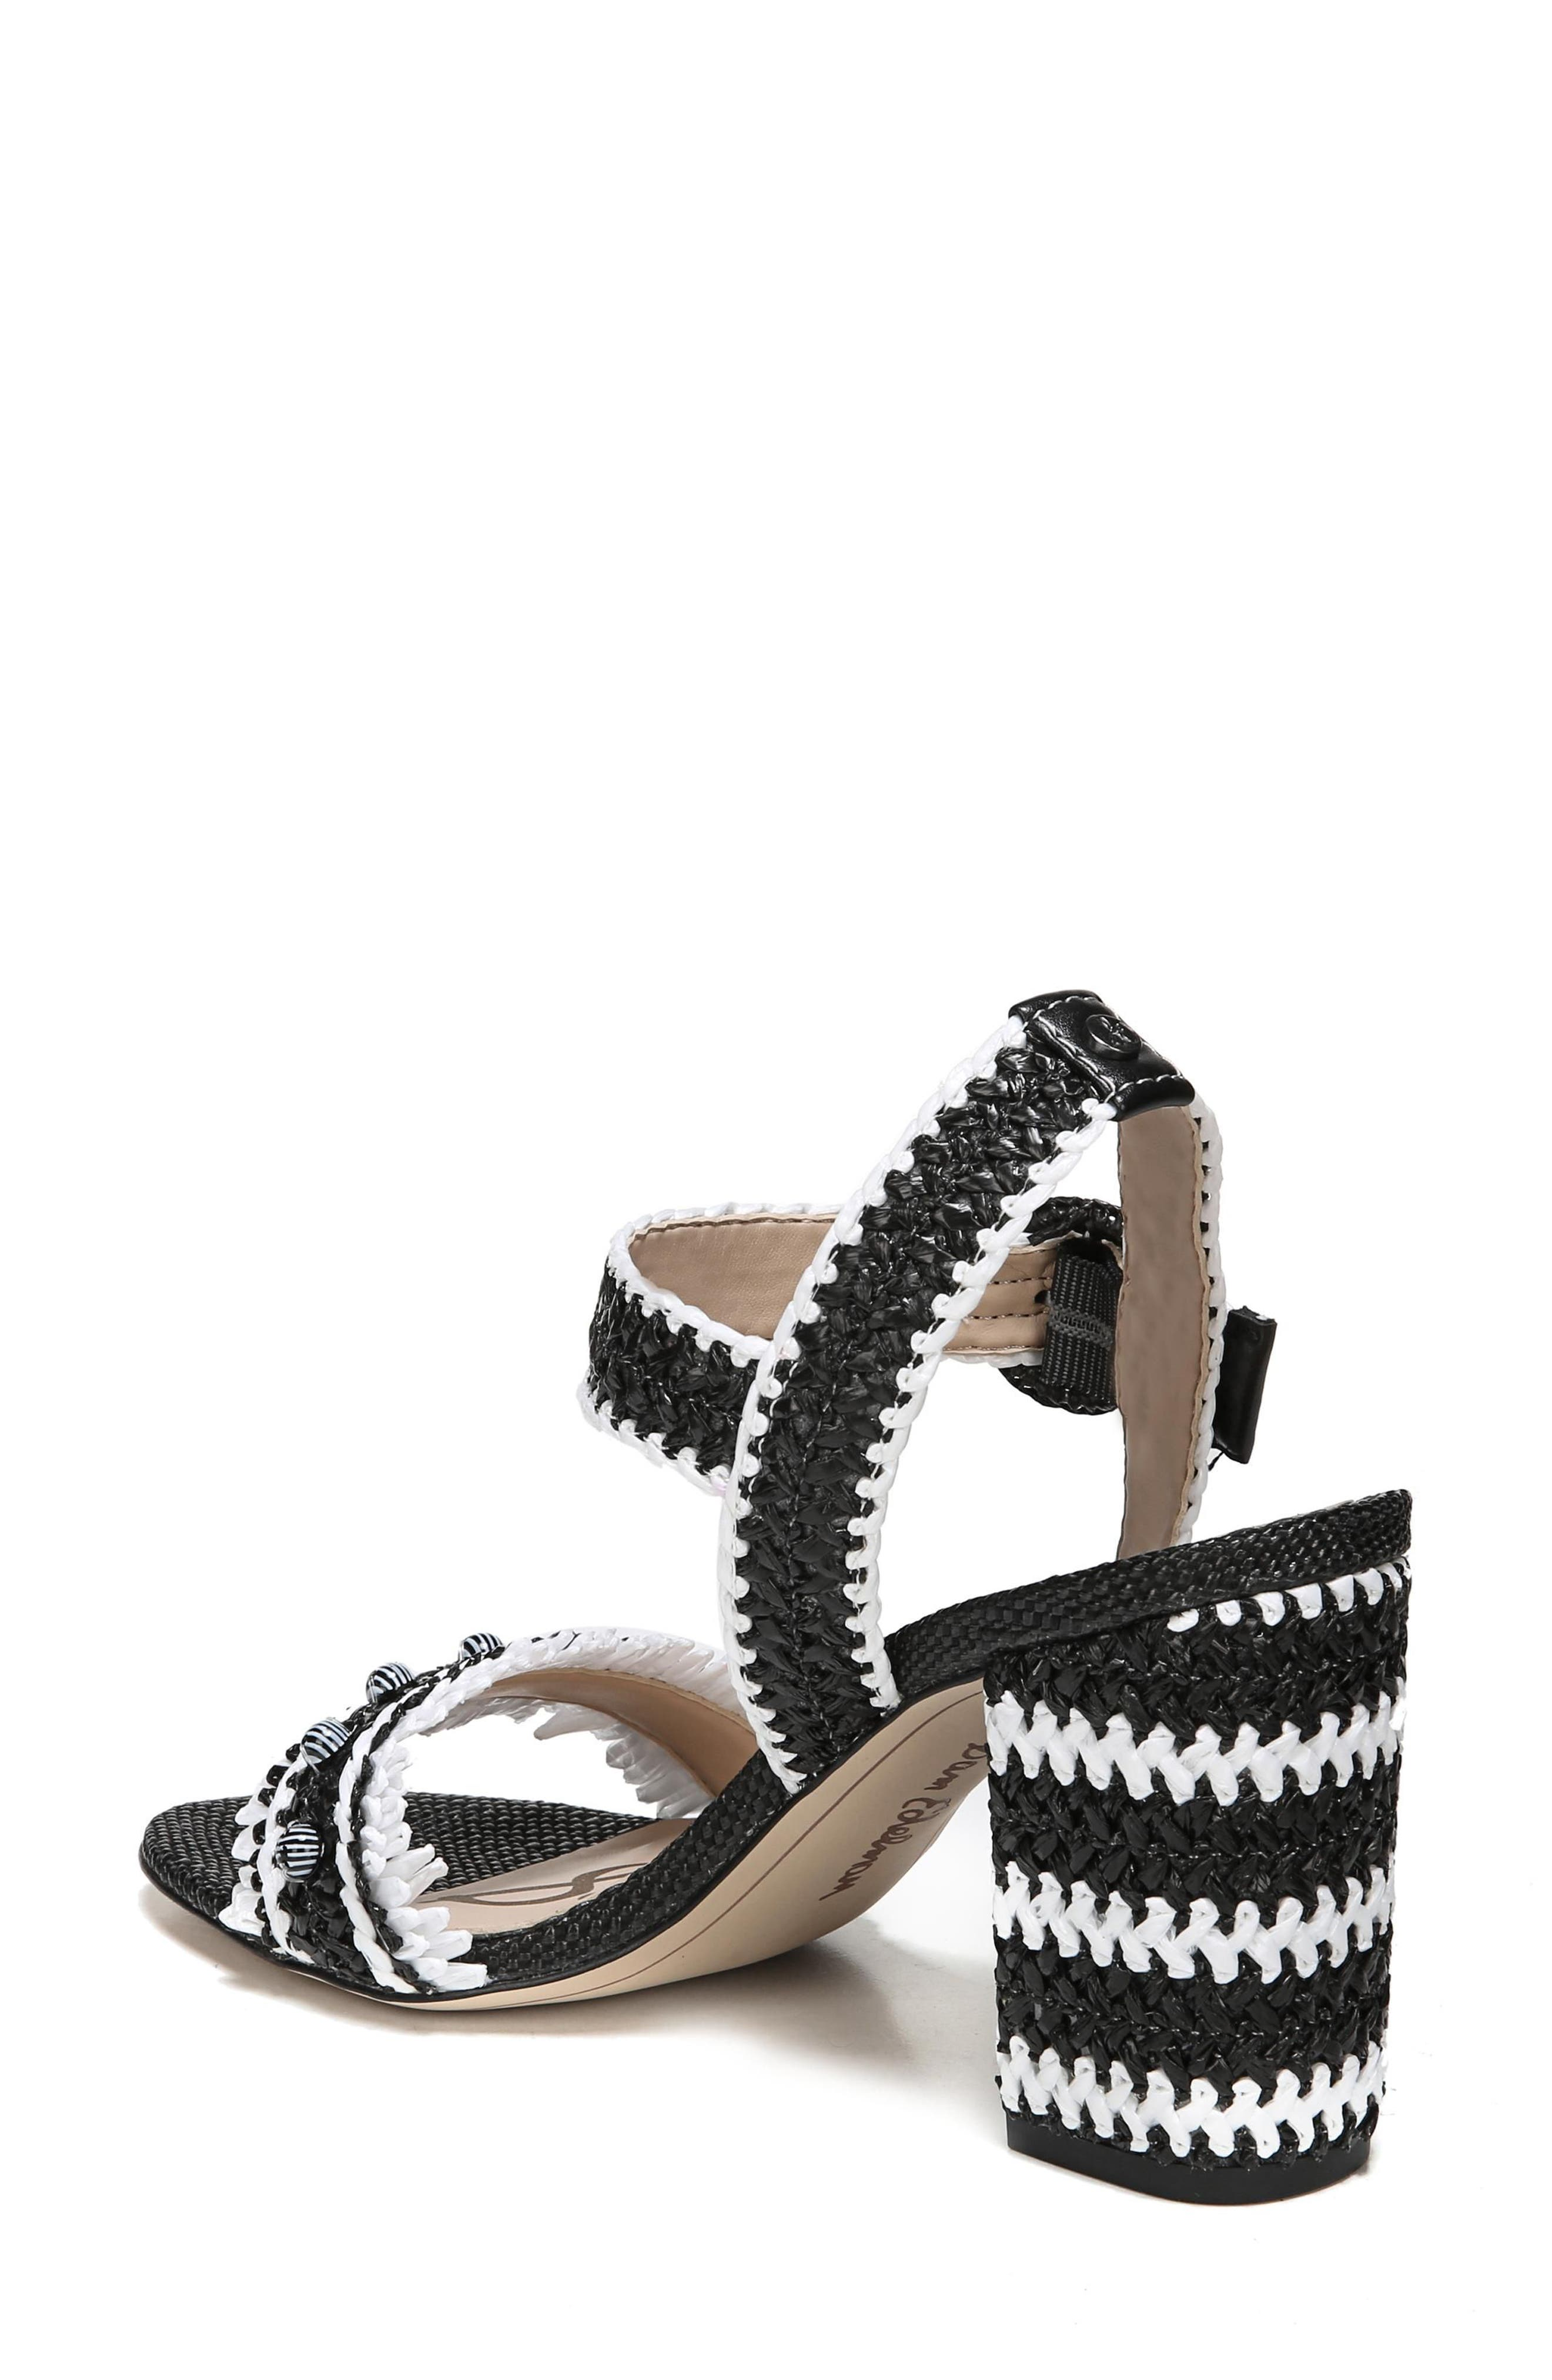 Olisa Block Heel Sandal,                             Alternate thumbnail 2, color,                             001